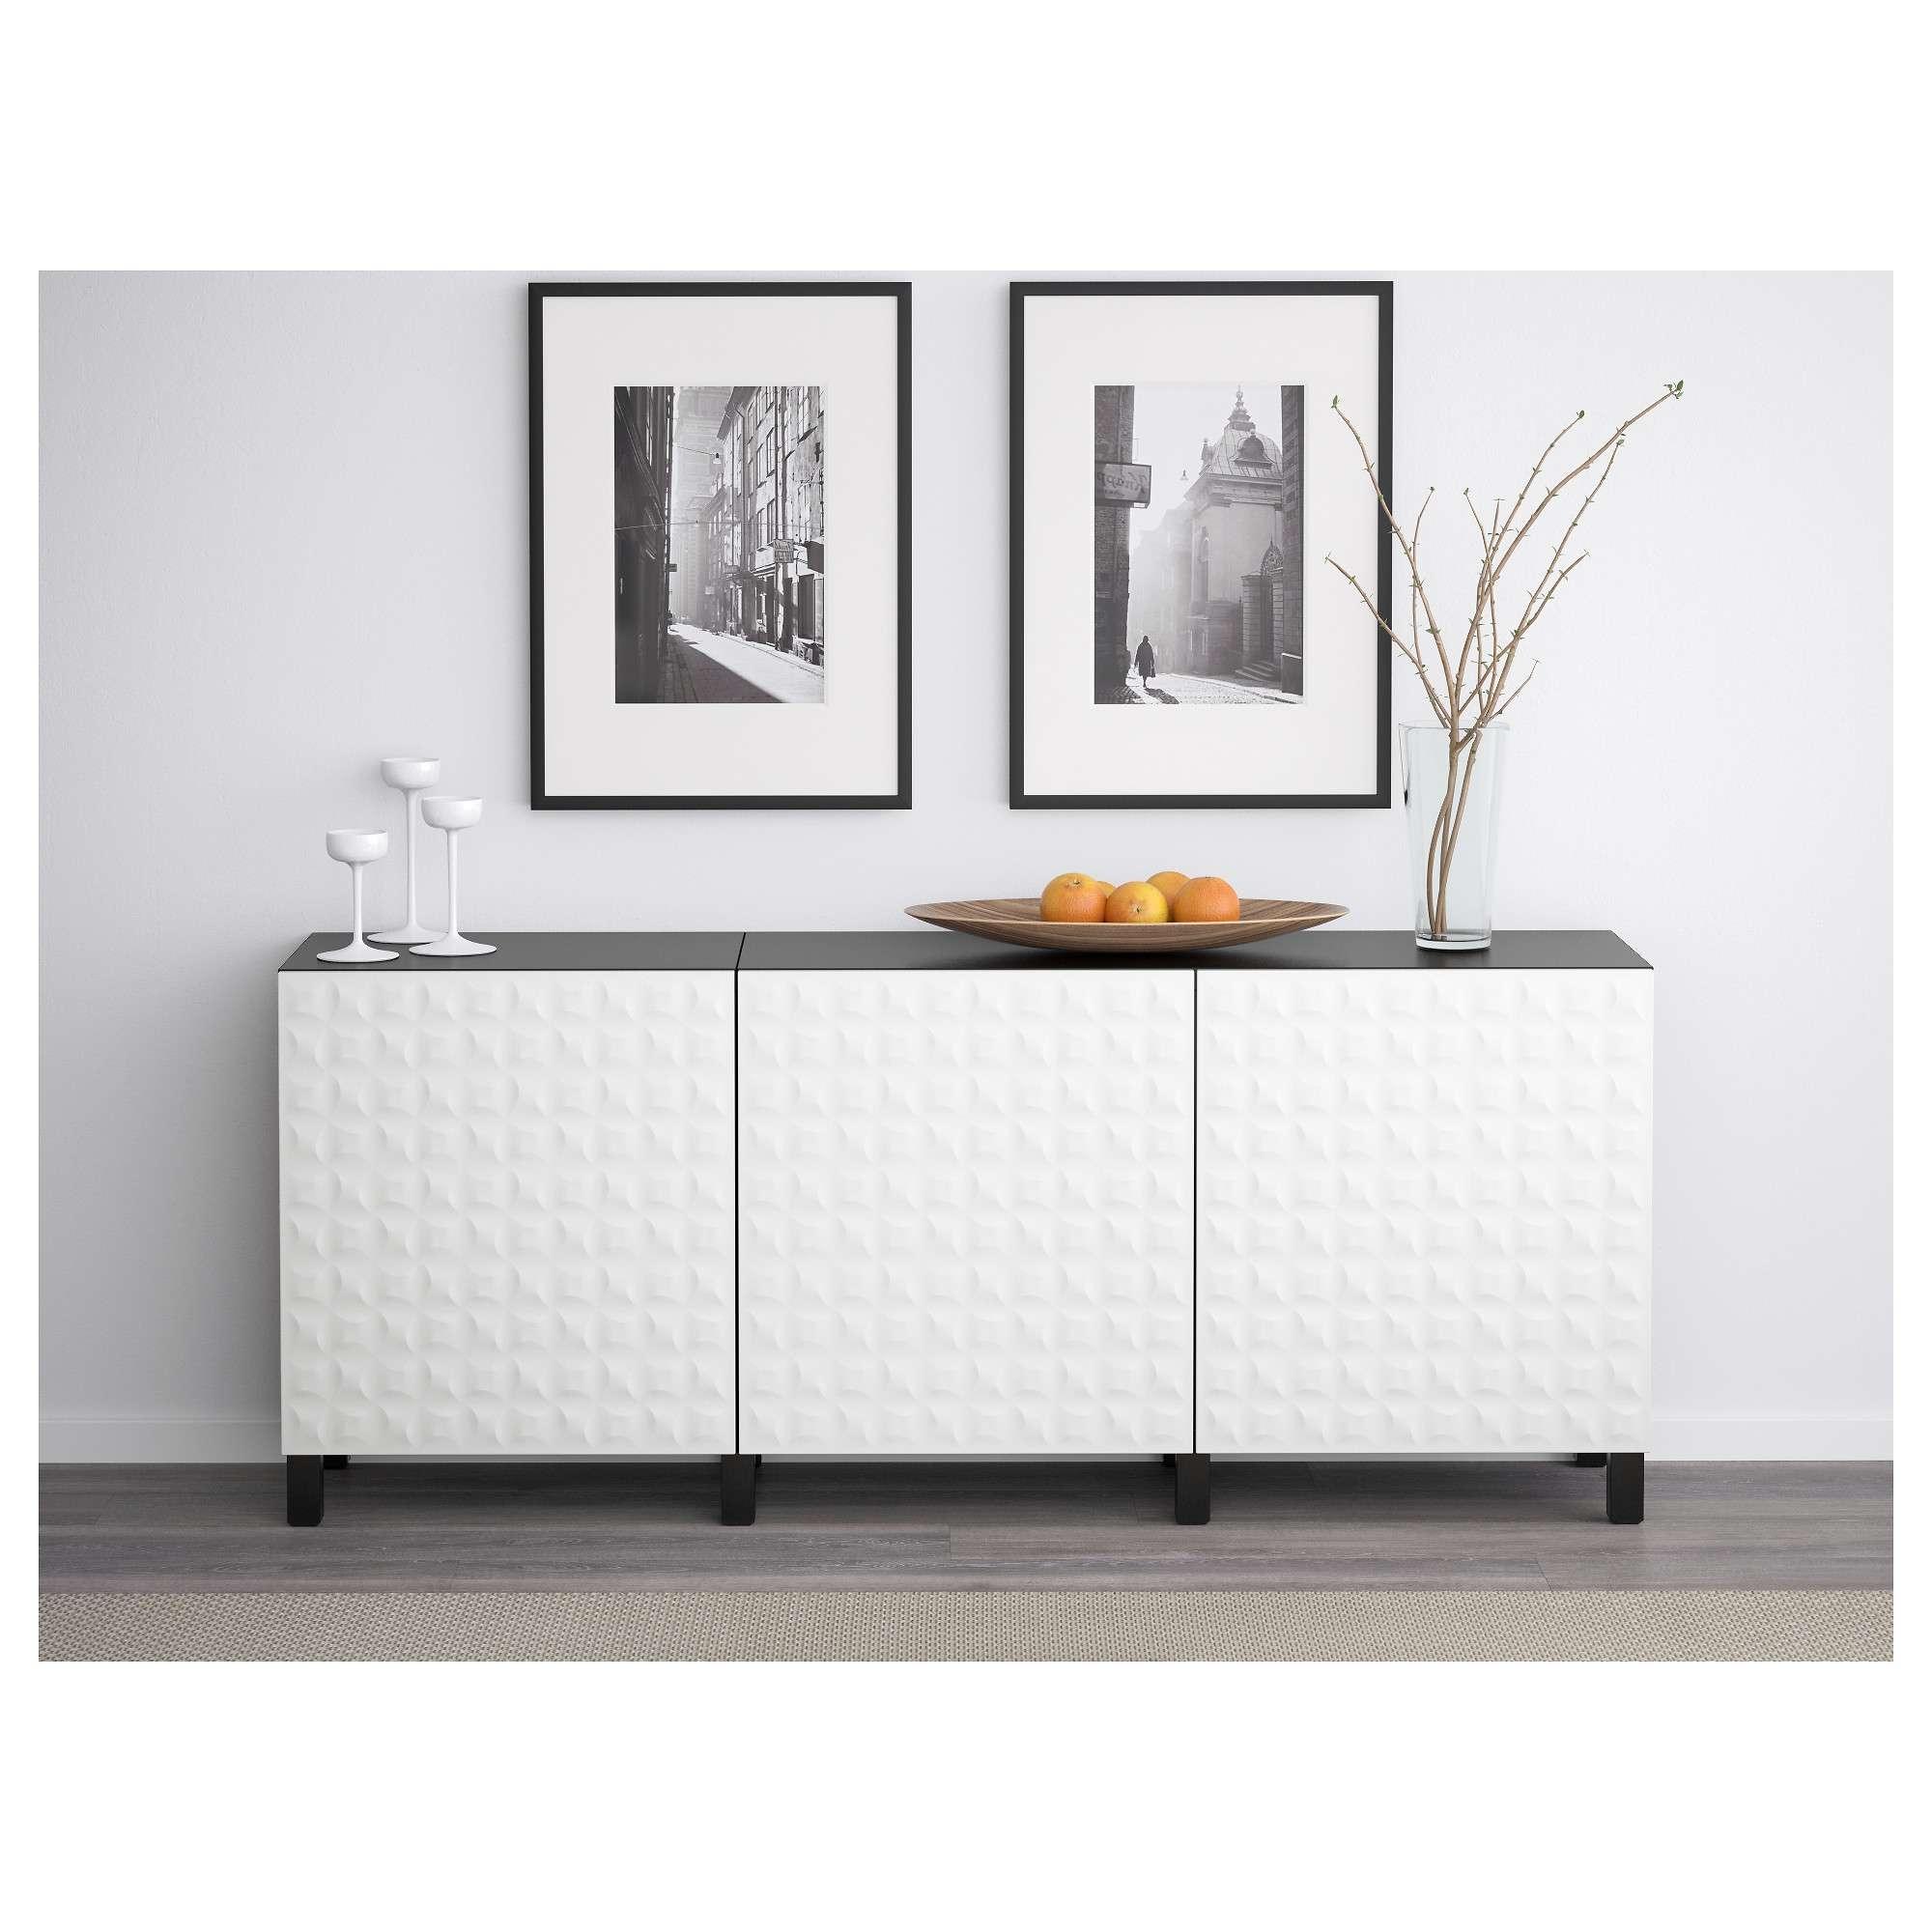 Besta Storage Combination With Doors Whiteselsviken High Gloss In Ikea Besta Sideboards (View 1 of 20)